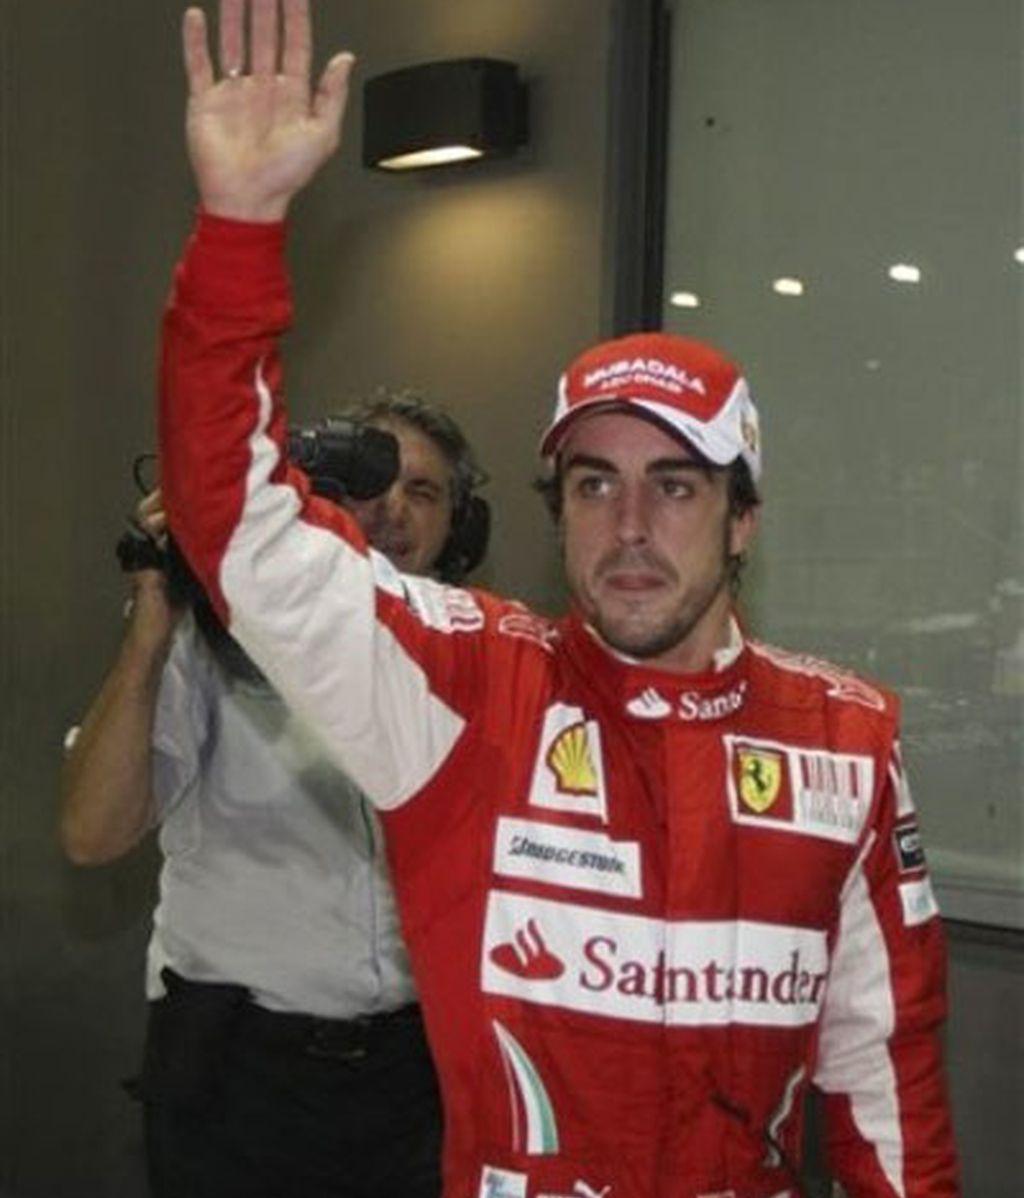 Segunda 'pole' consecutiva para Alonso, la 20ª de su carrera deportiva